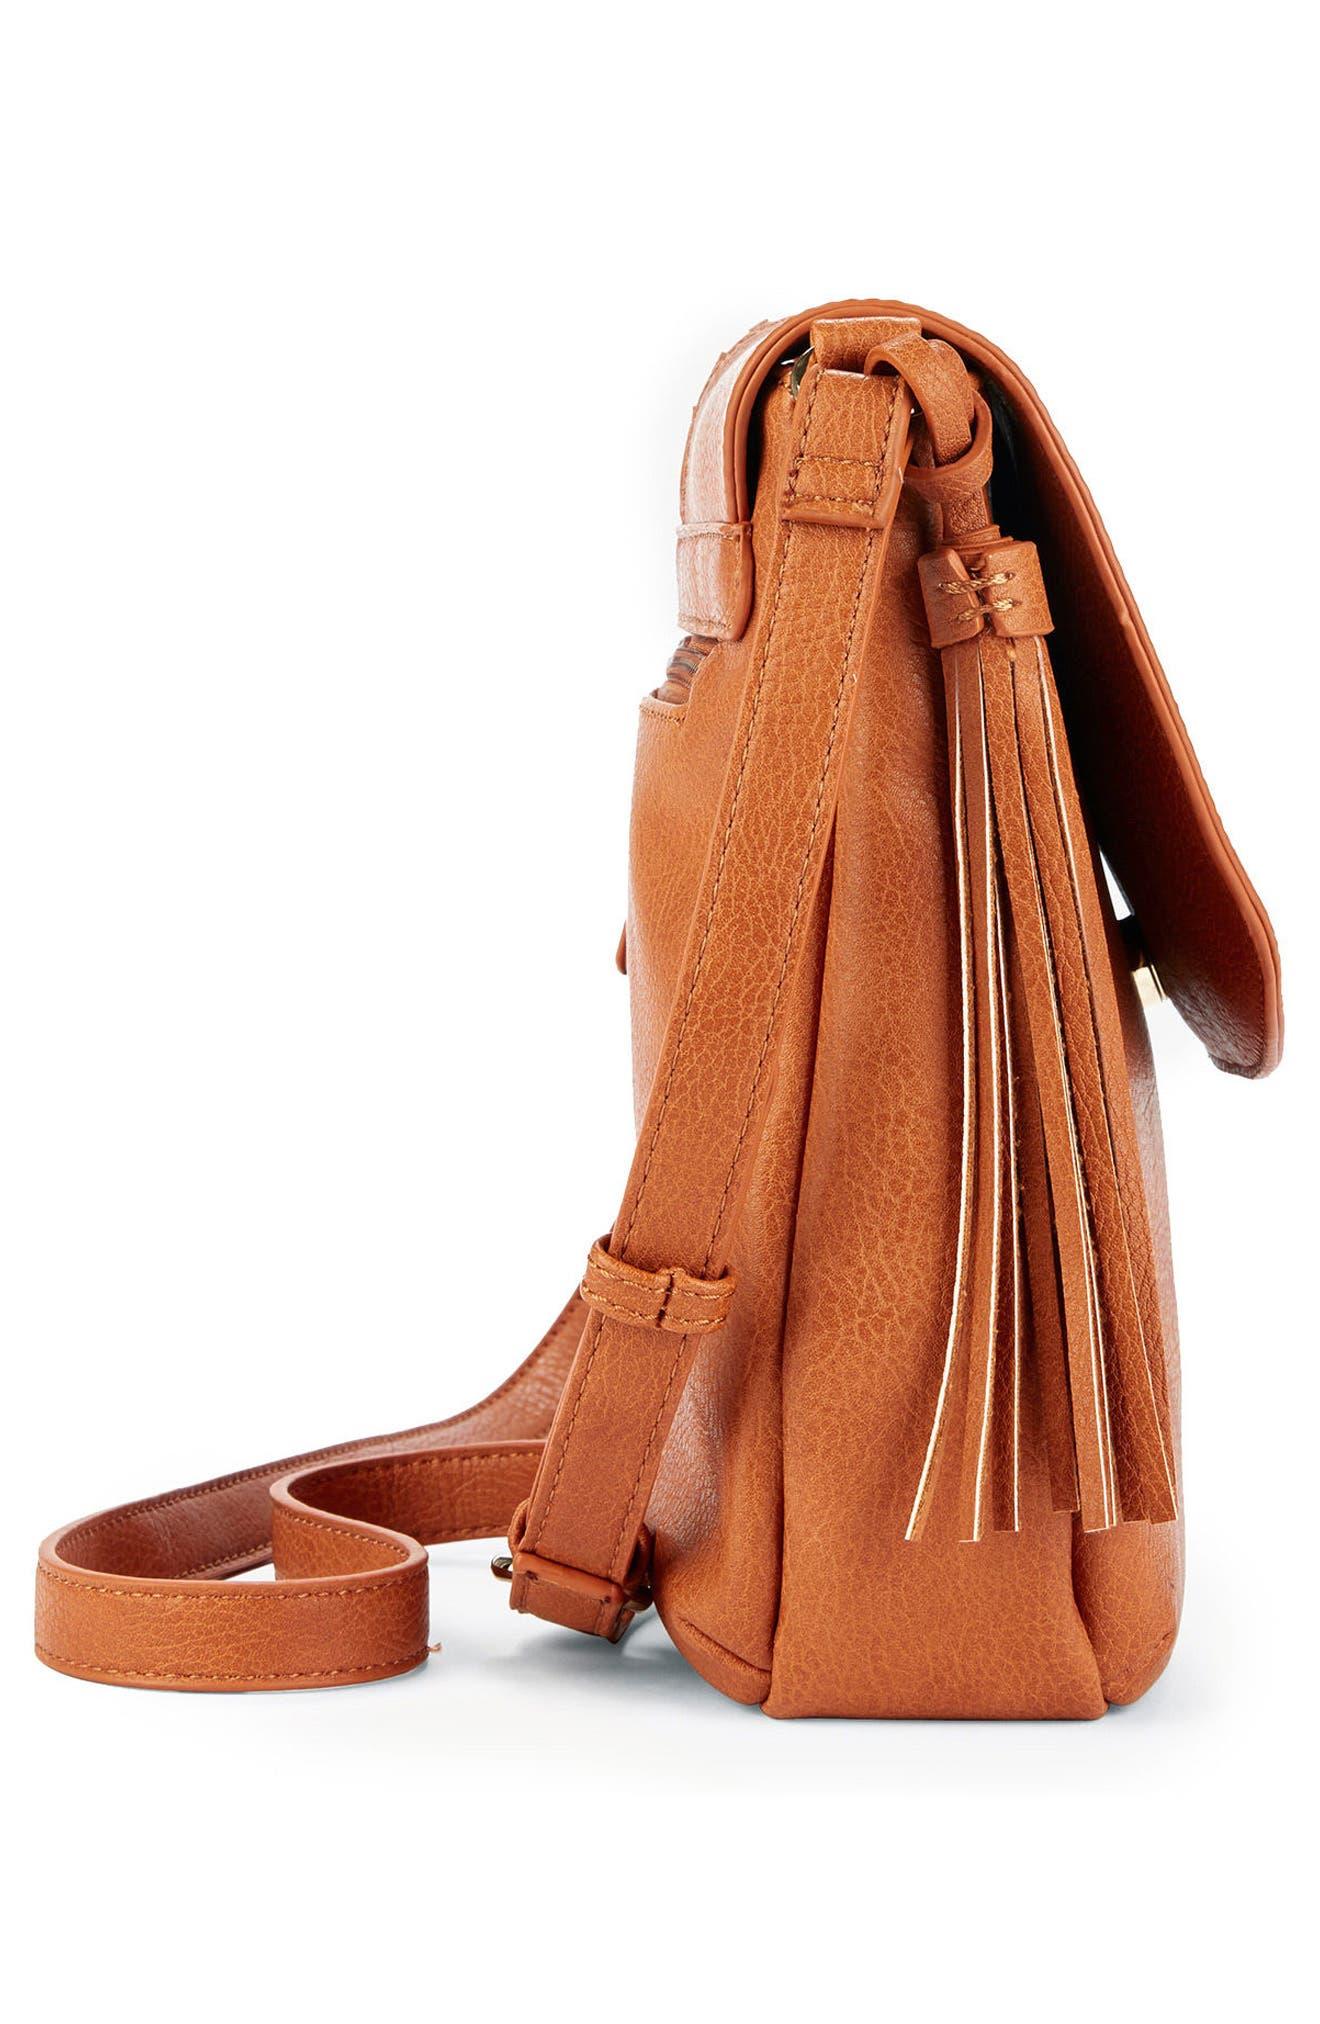 Tara Stitch Detail Faux Leather Crossbody Bag,                             Alternate thumbnail 3, color,                             Cognac